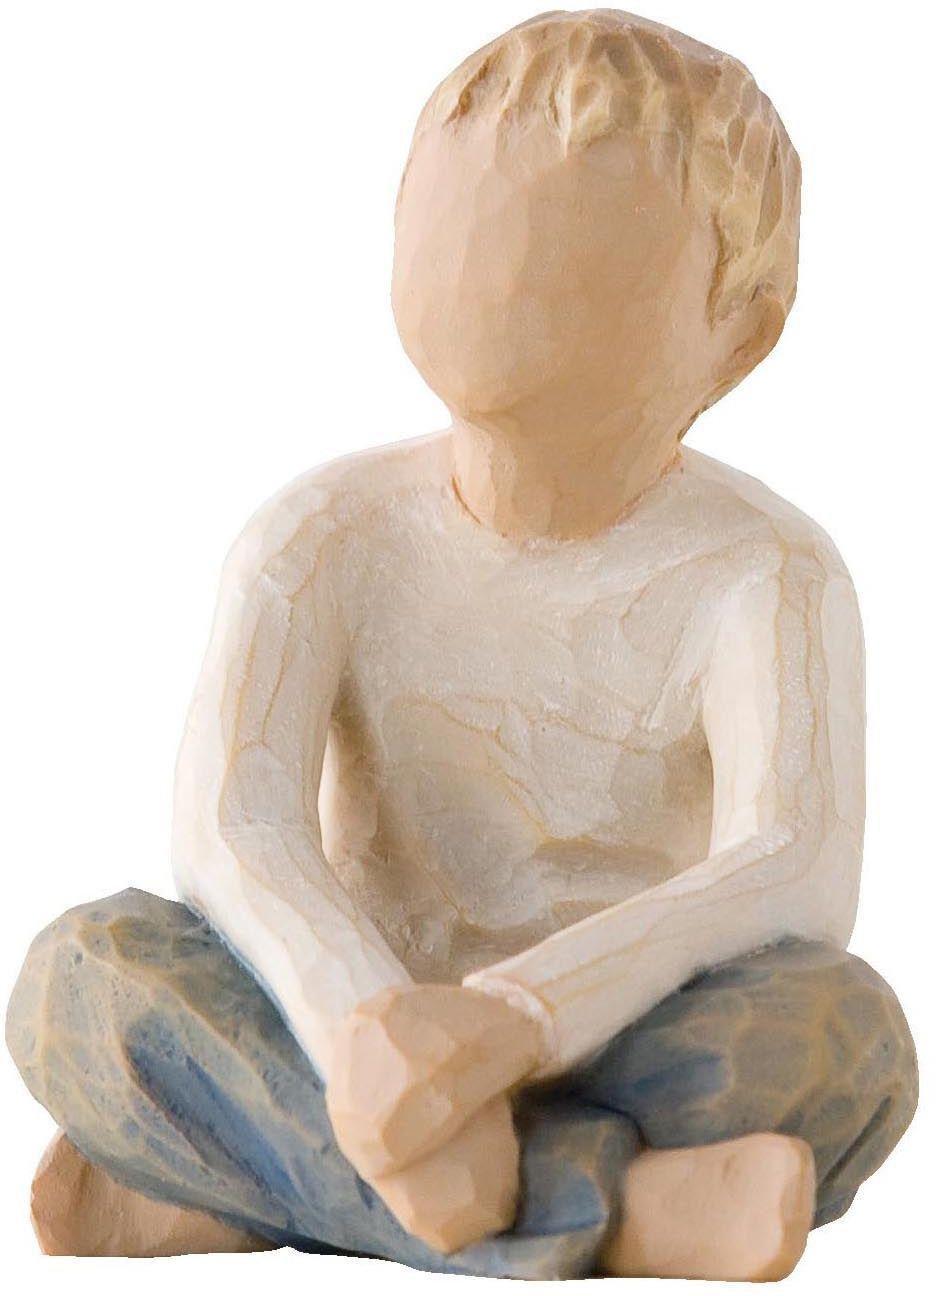 Willow Tree Imaginative Child Figurine.